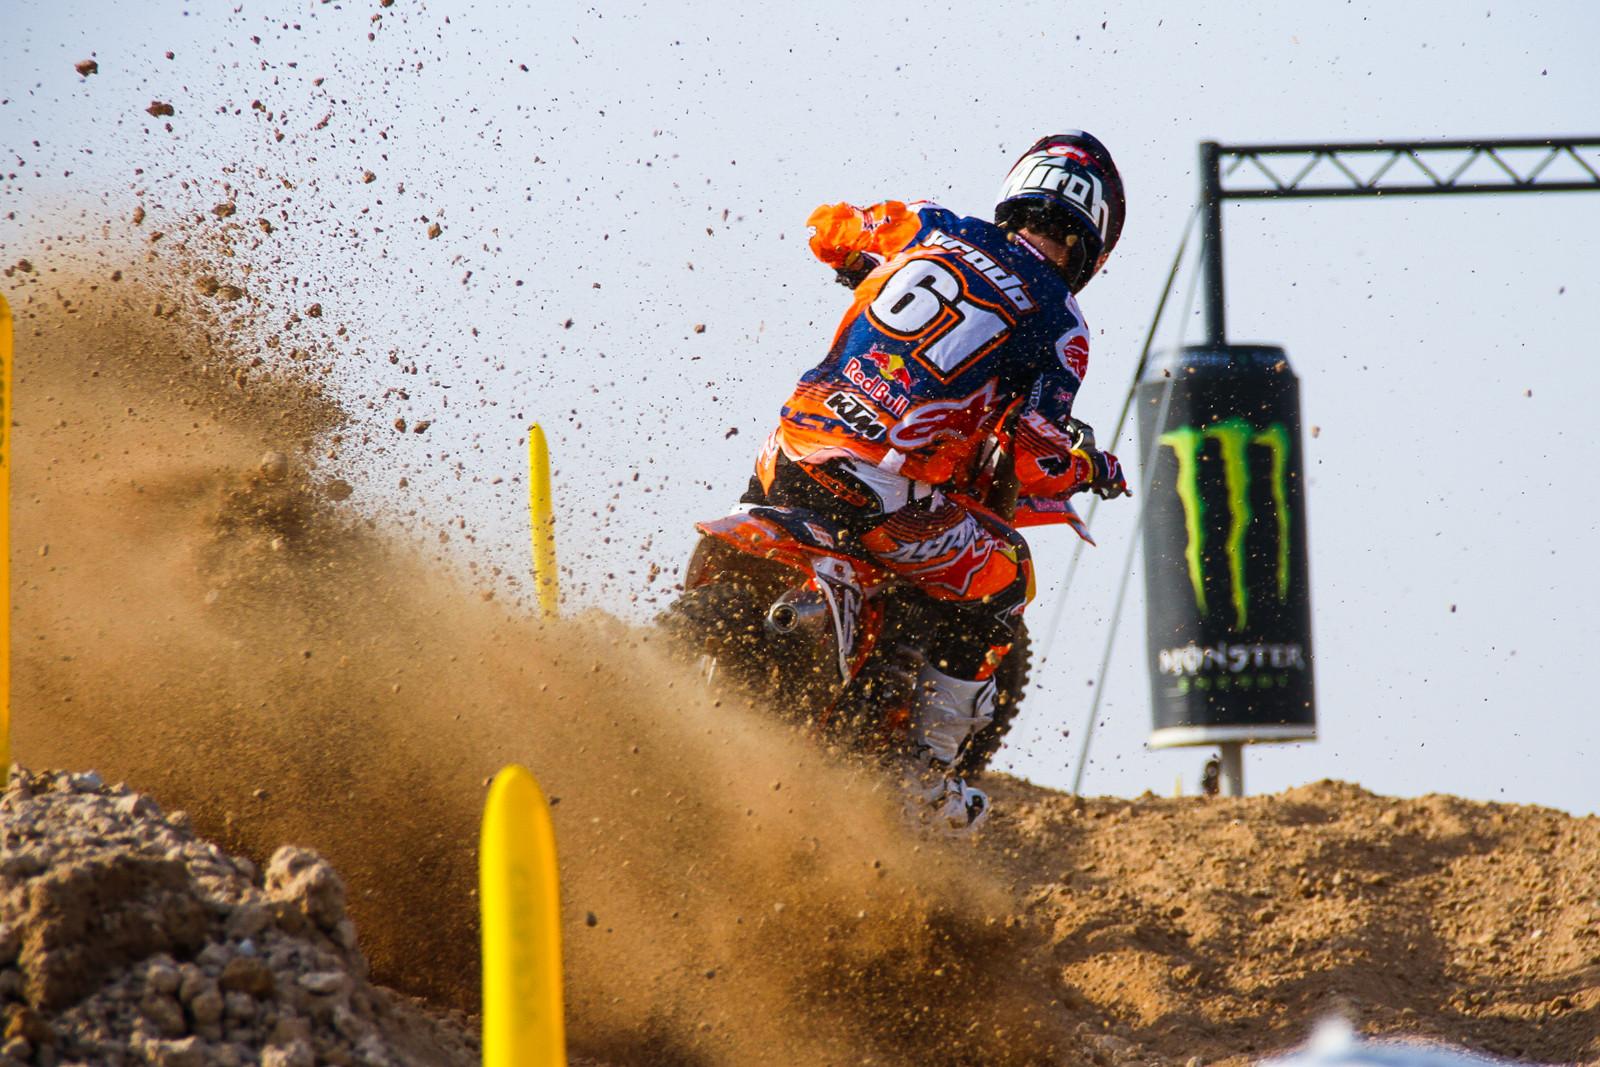 Jorge Prado Garcia - Photo Blast: 2017 MXGP of Qatar - Motocross Pictures - Vital MX